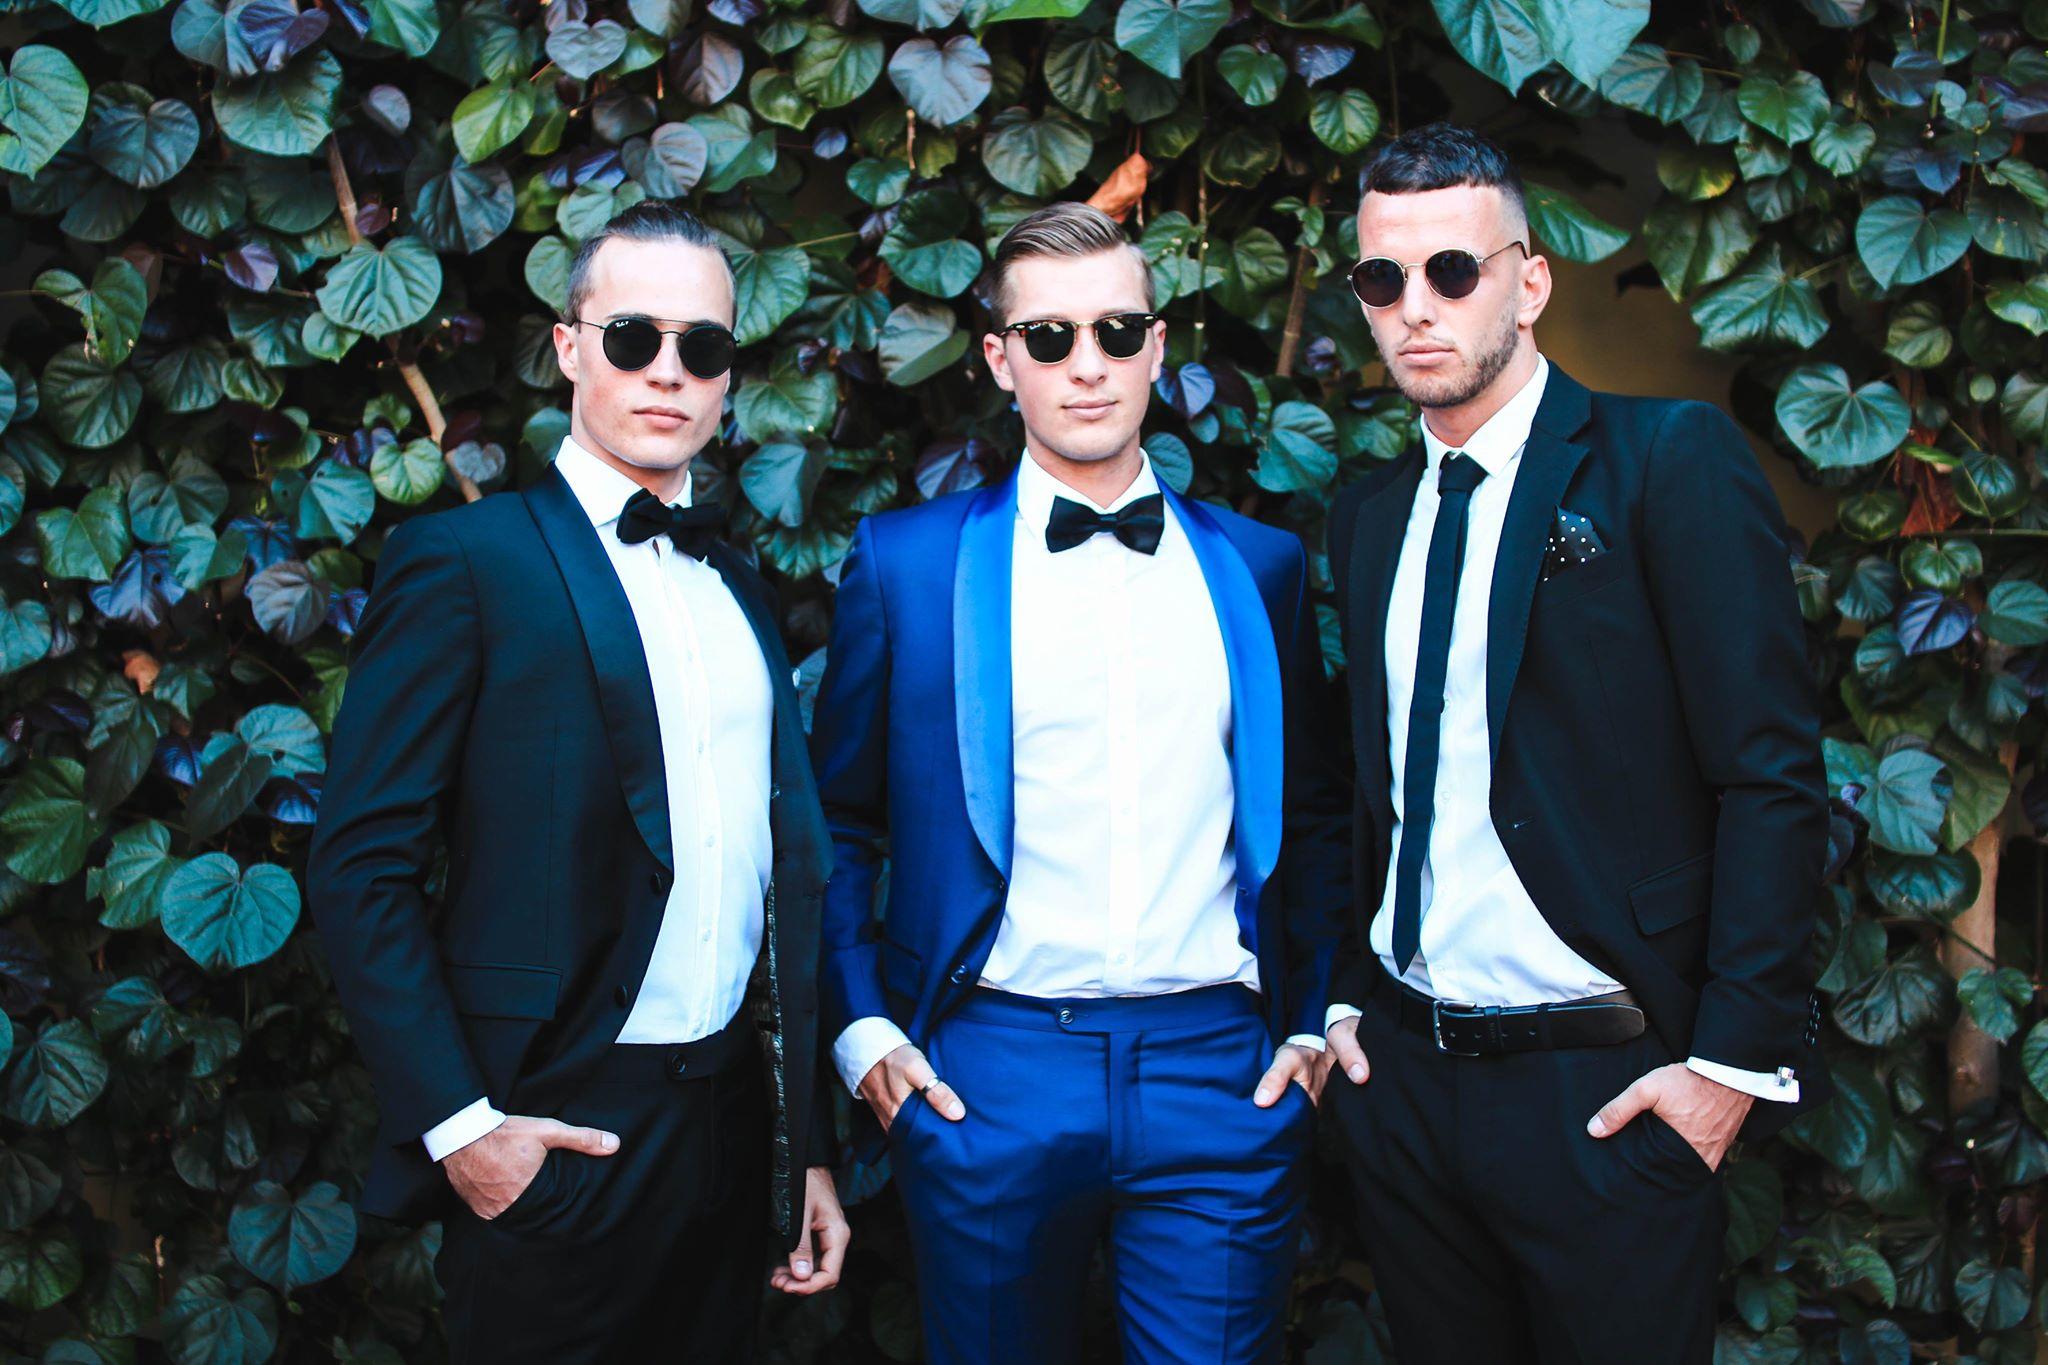 Suit Vault School Ball Suit Tuxedo Hire Perth